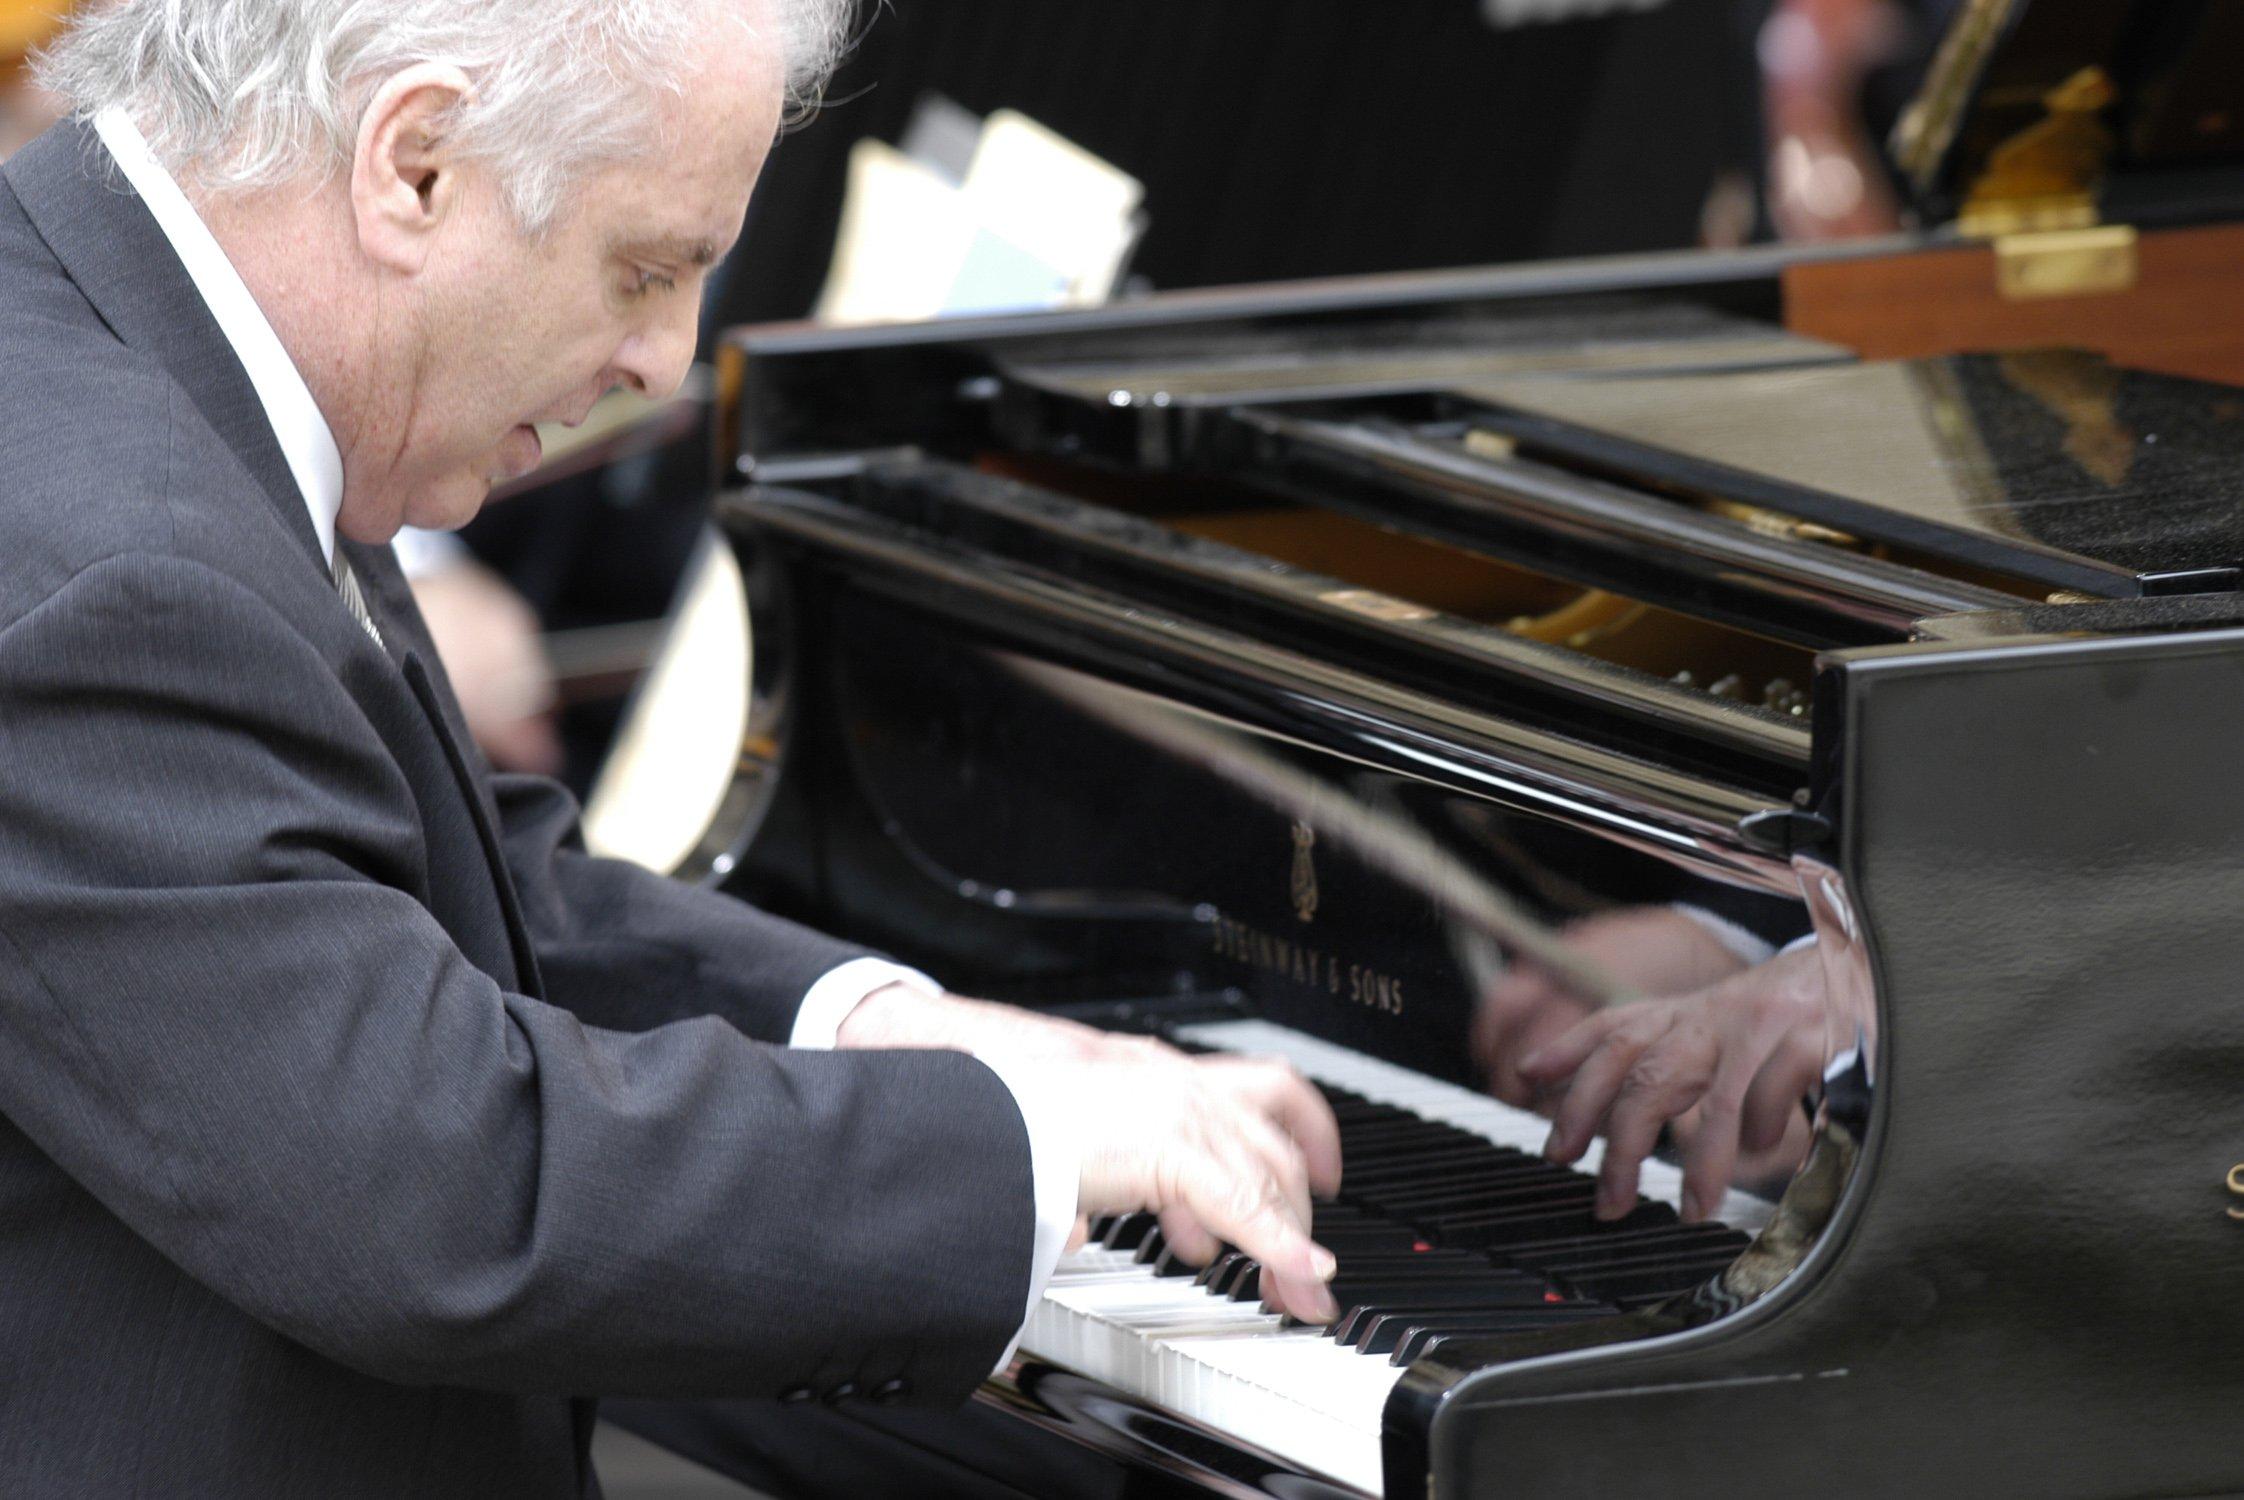 Daniel Barenboim, Staatskapelle Berlin, Gustavo Dudamel - Johannes Brahms: The Piano Concertos (2015) 2CDs